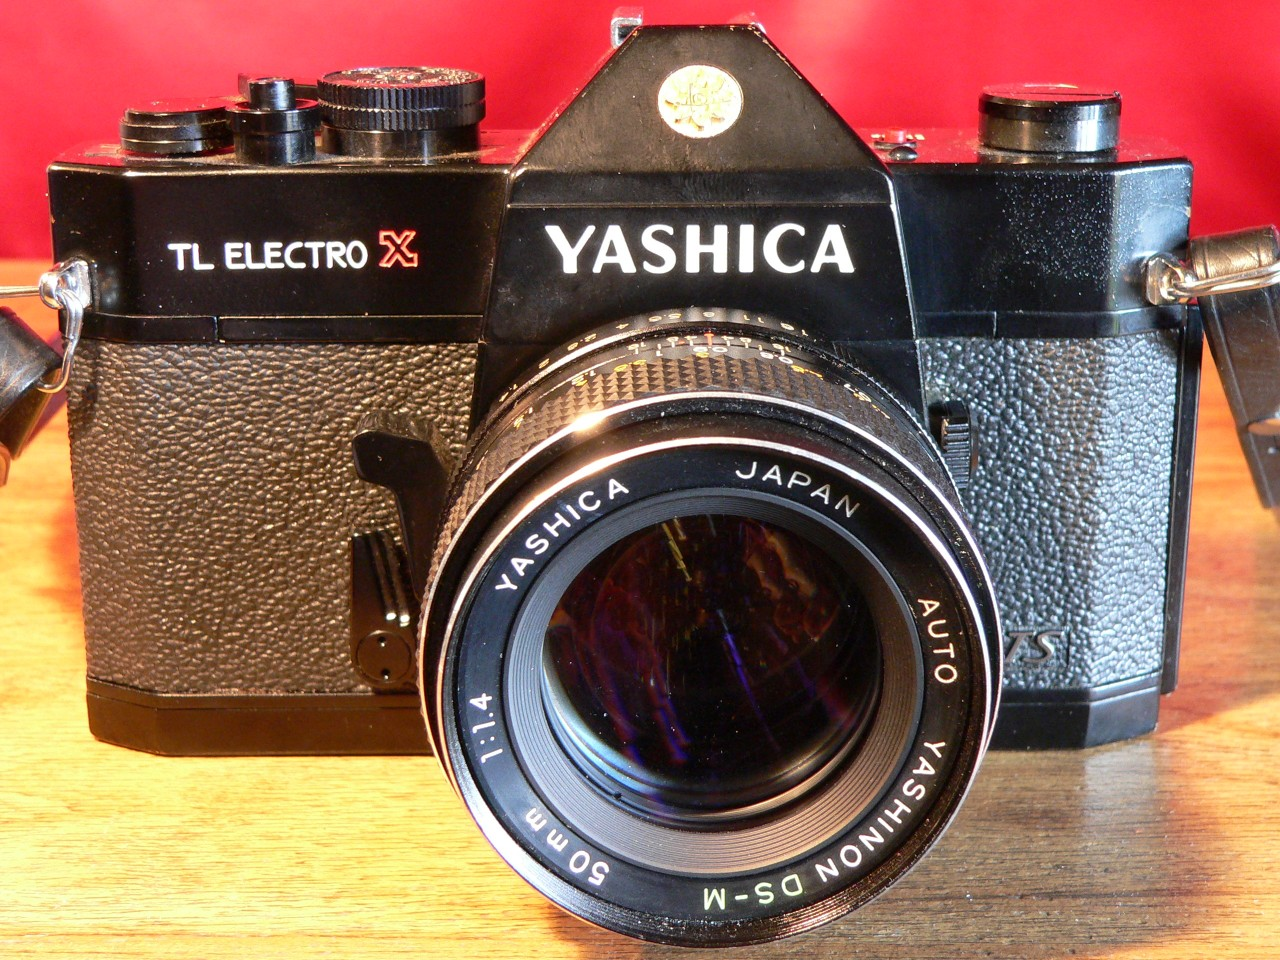 Yashica TL Electro-X ITS Black  (1973-1974)